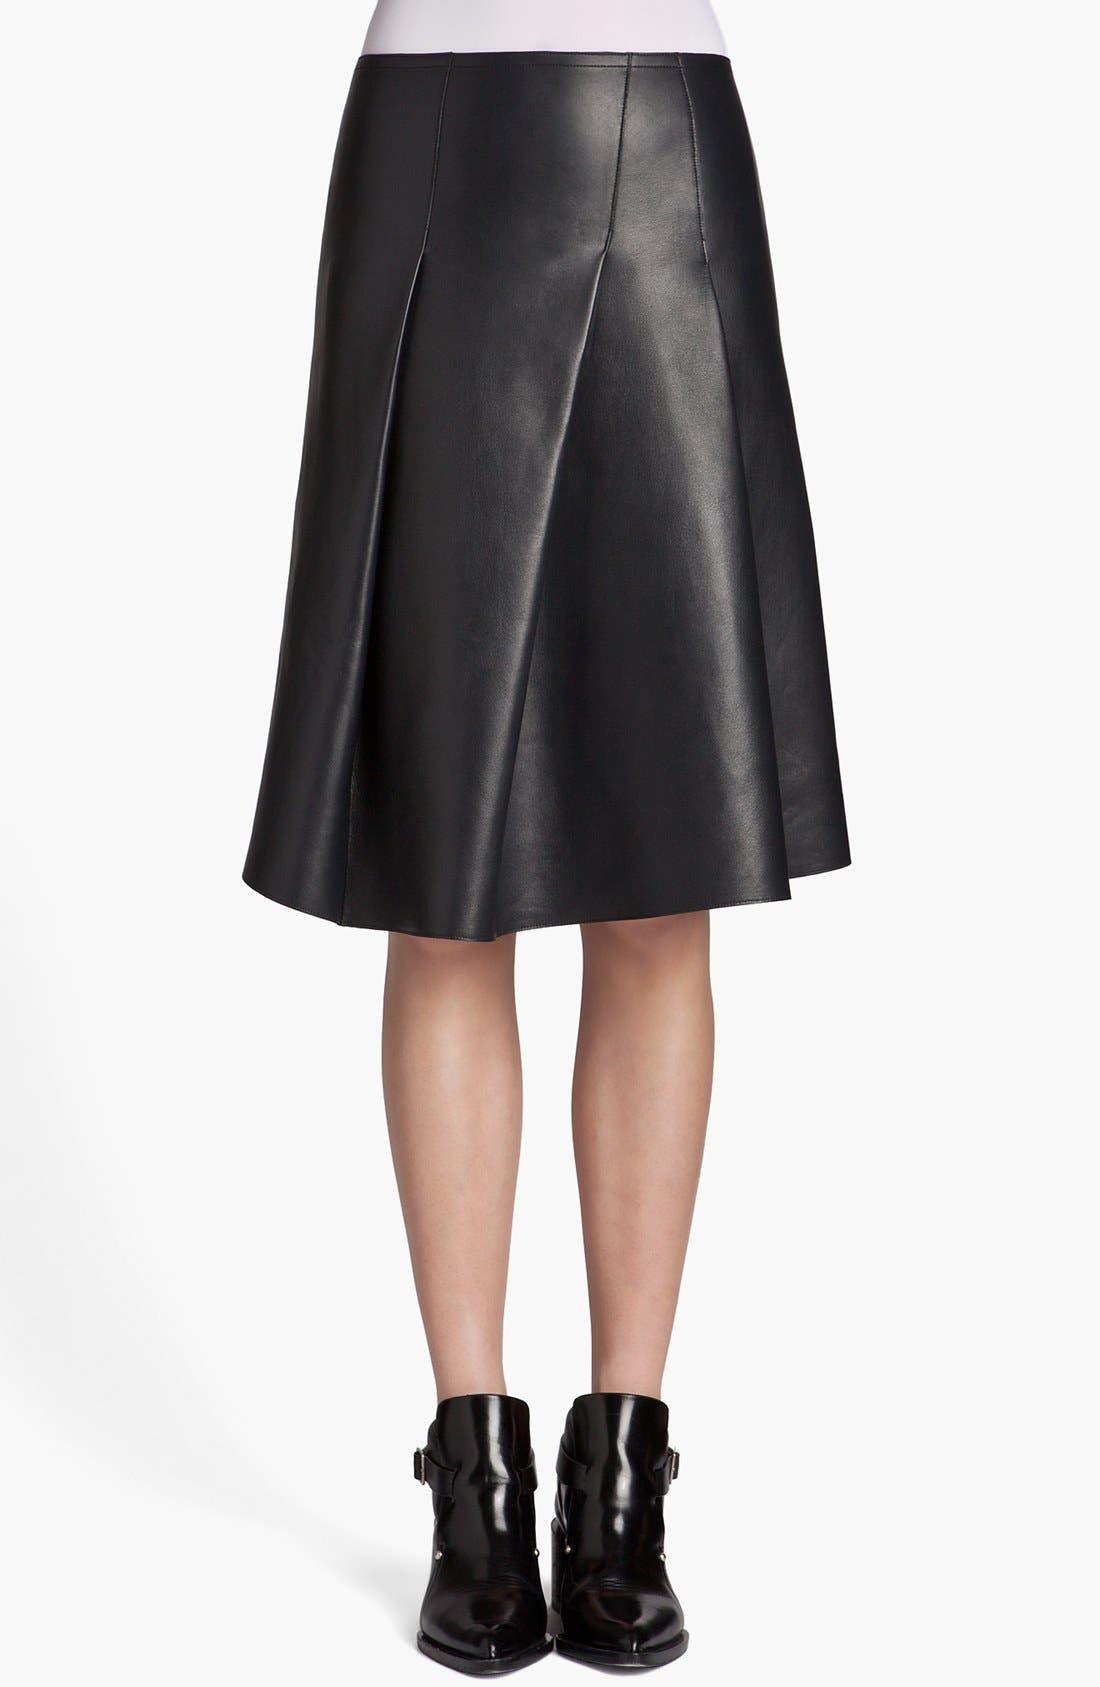 Alternate Image 1 Selected - Jil Sander 'Pom Pom' Pleated Leather Skirt